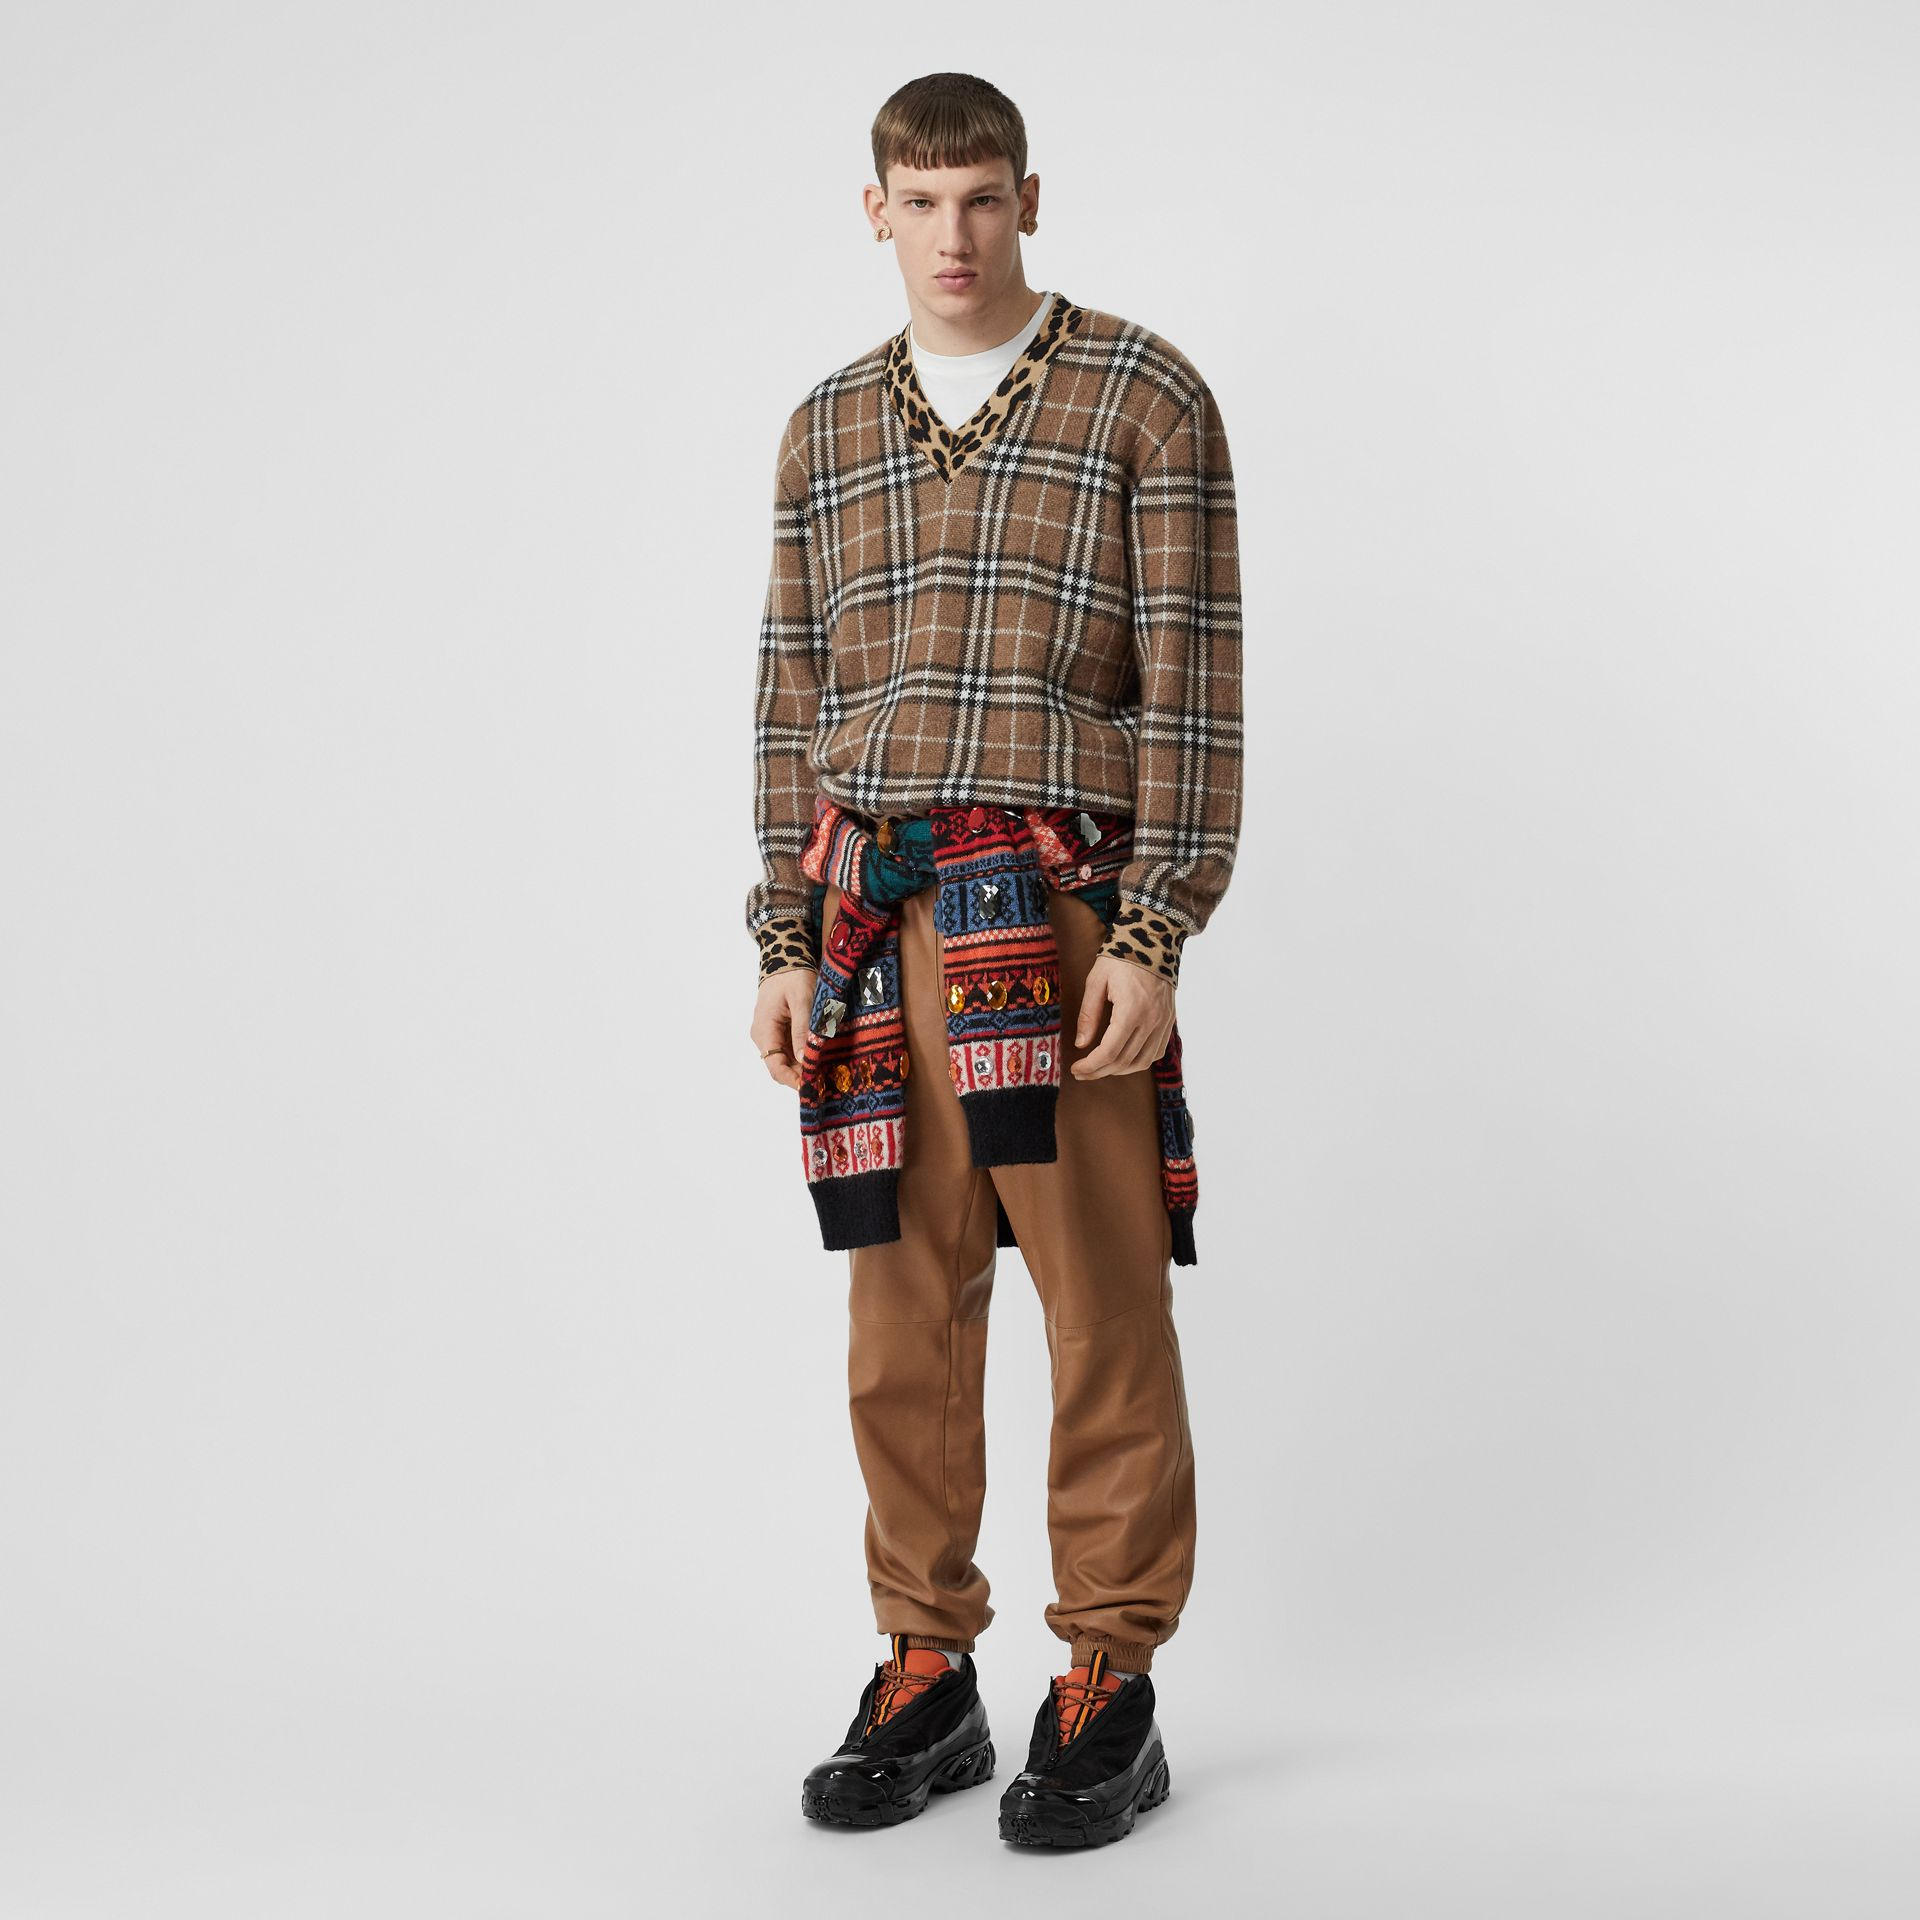 Leopard Detail Vintage Check Cashmere Blend Sweater in Warm Walnut - Men | Burberry United Kingdom - gallery image 4